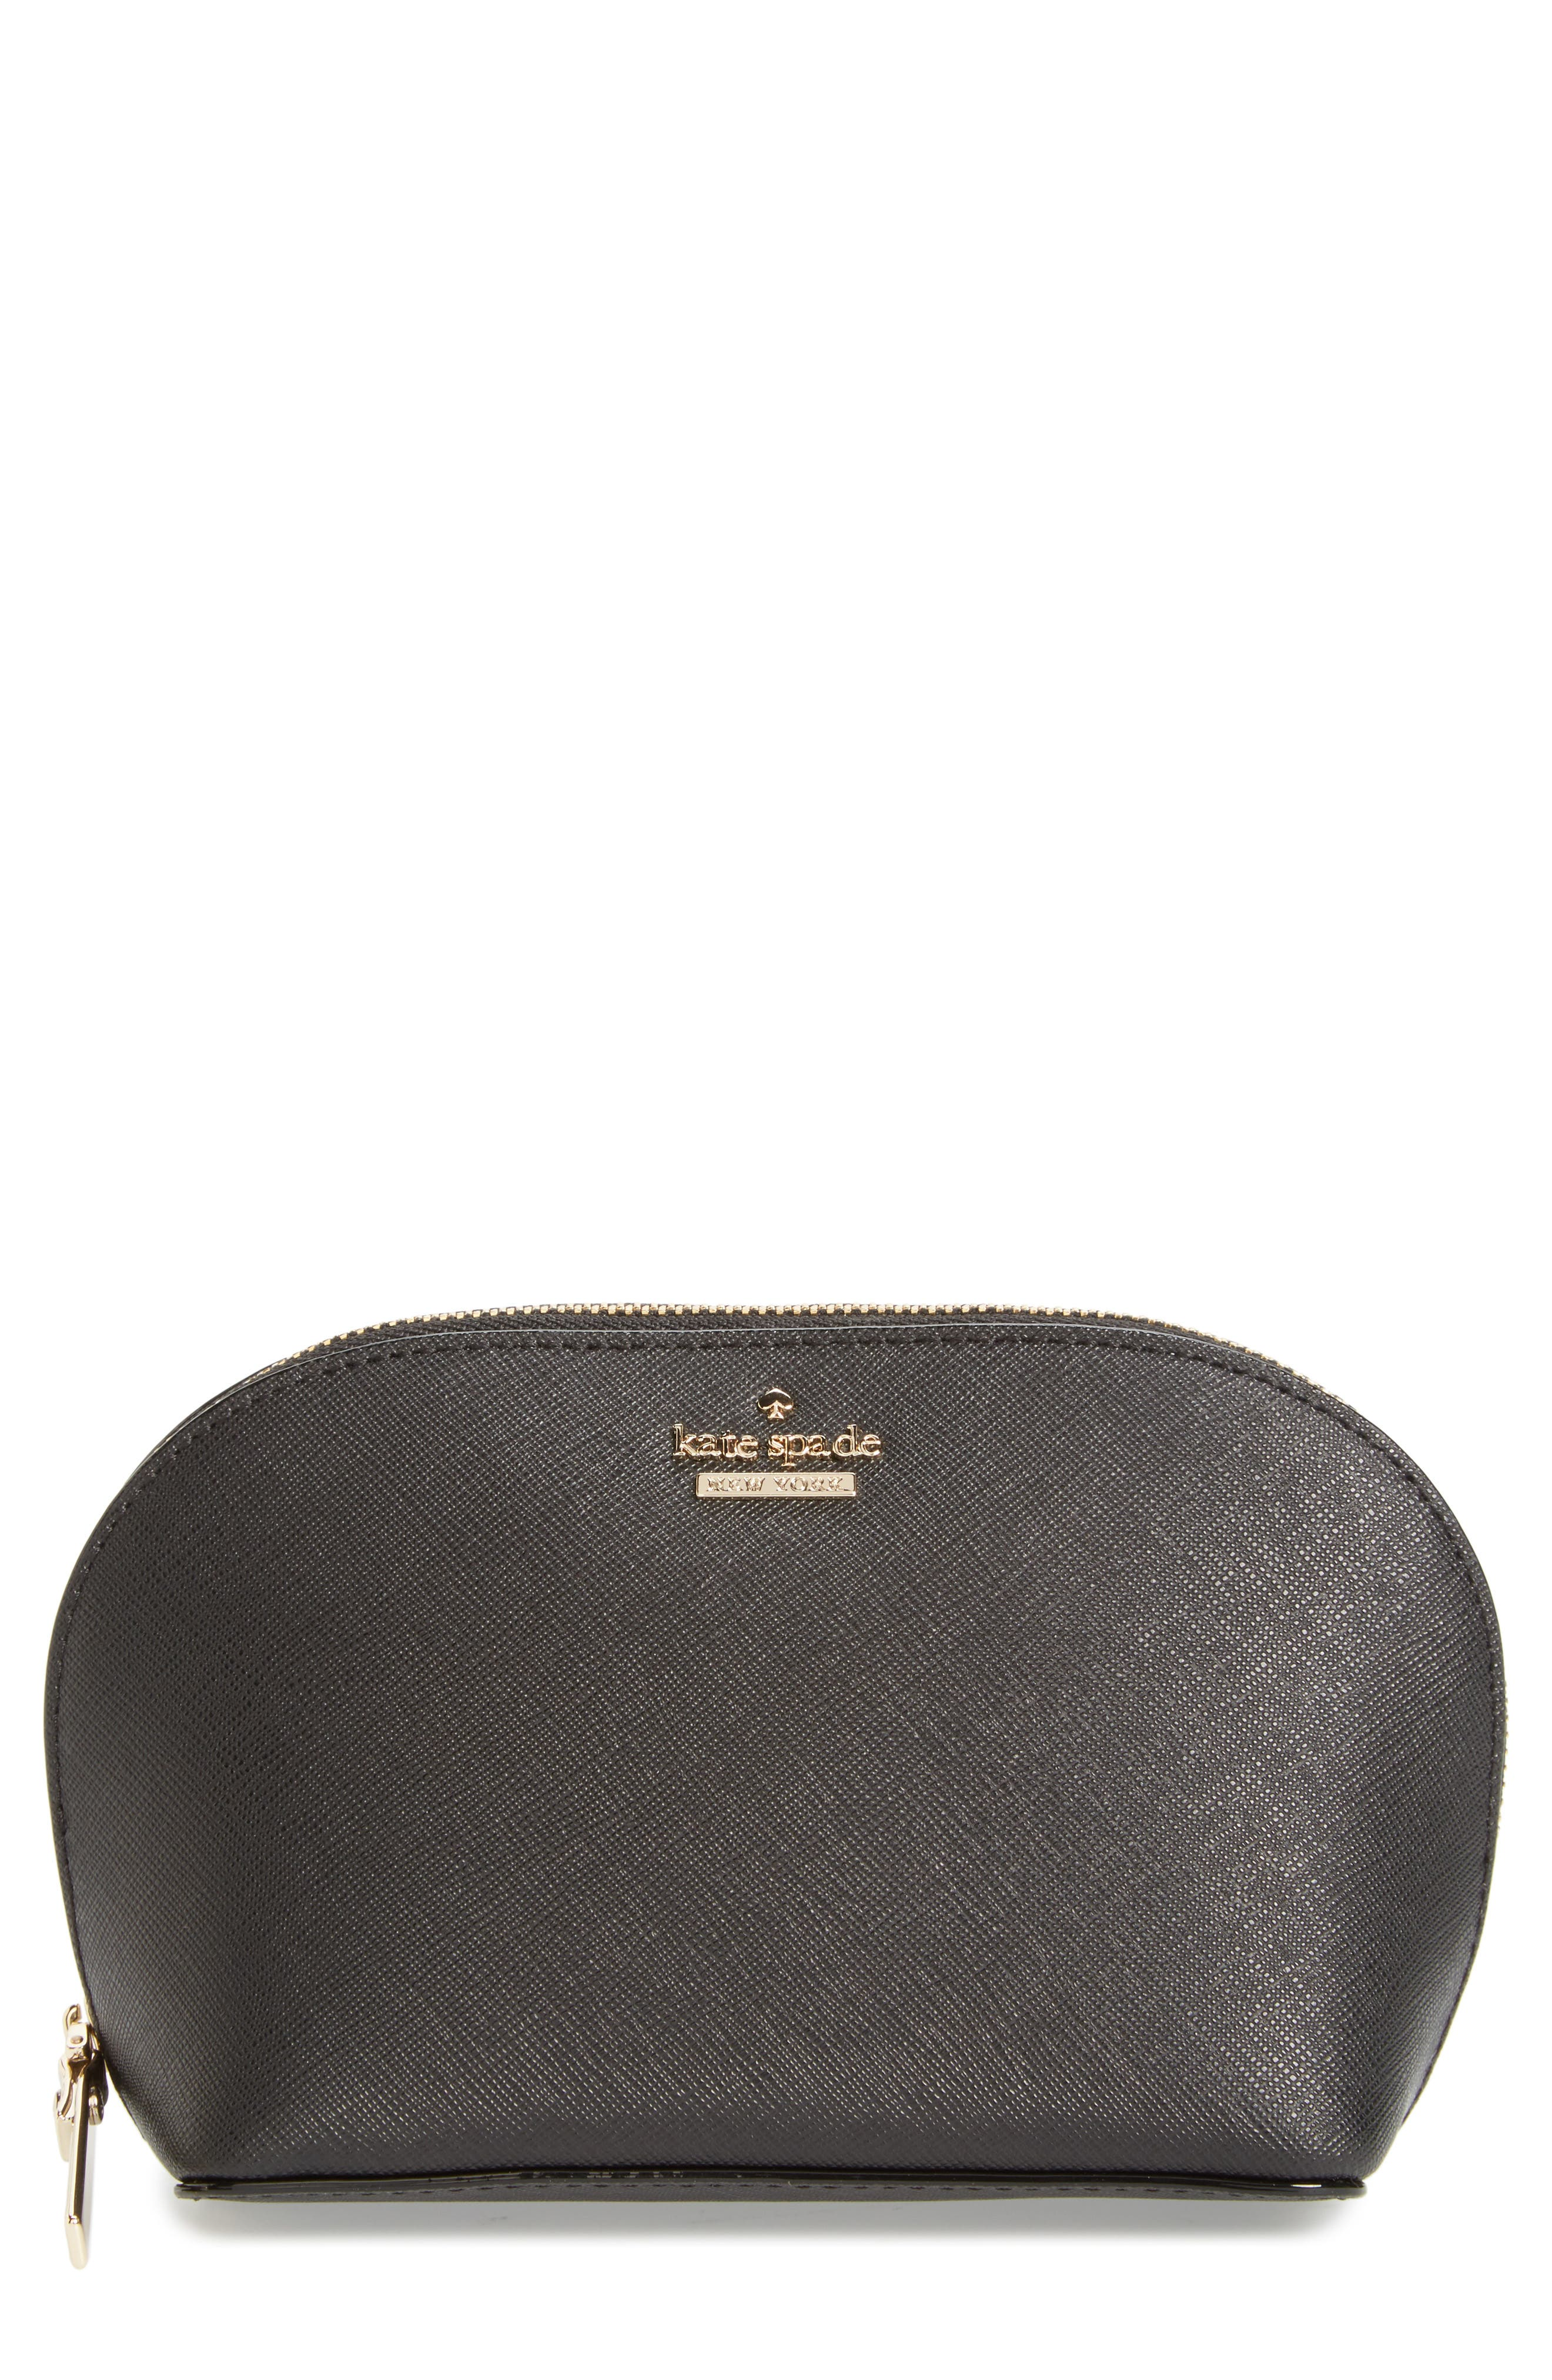 cameron street - small abalene leather cosmetics bag,                         Main,                         color, BLACK